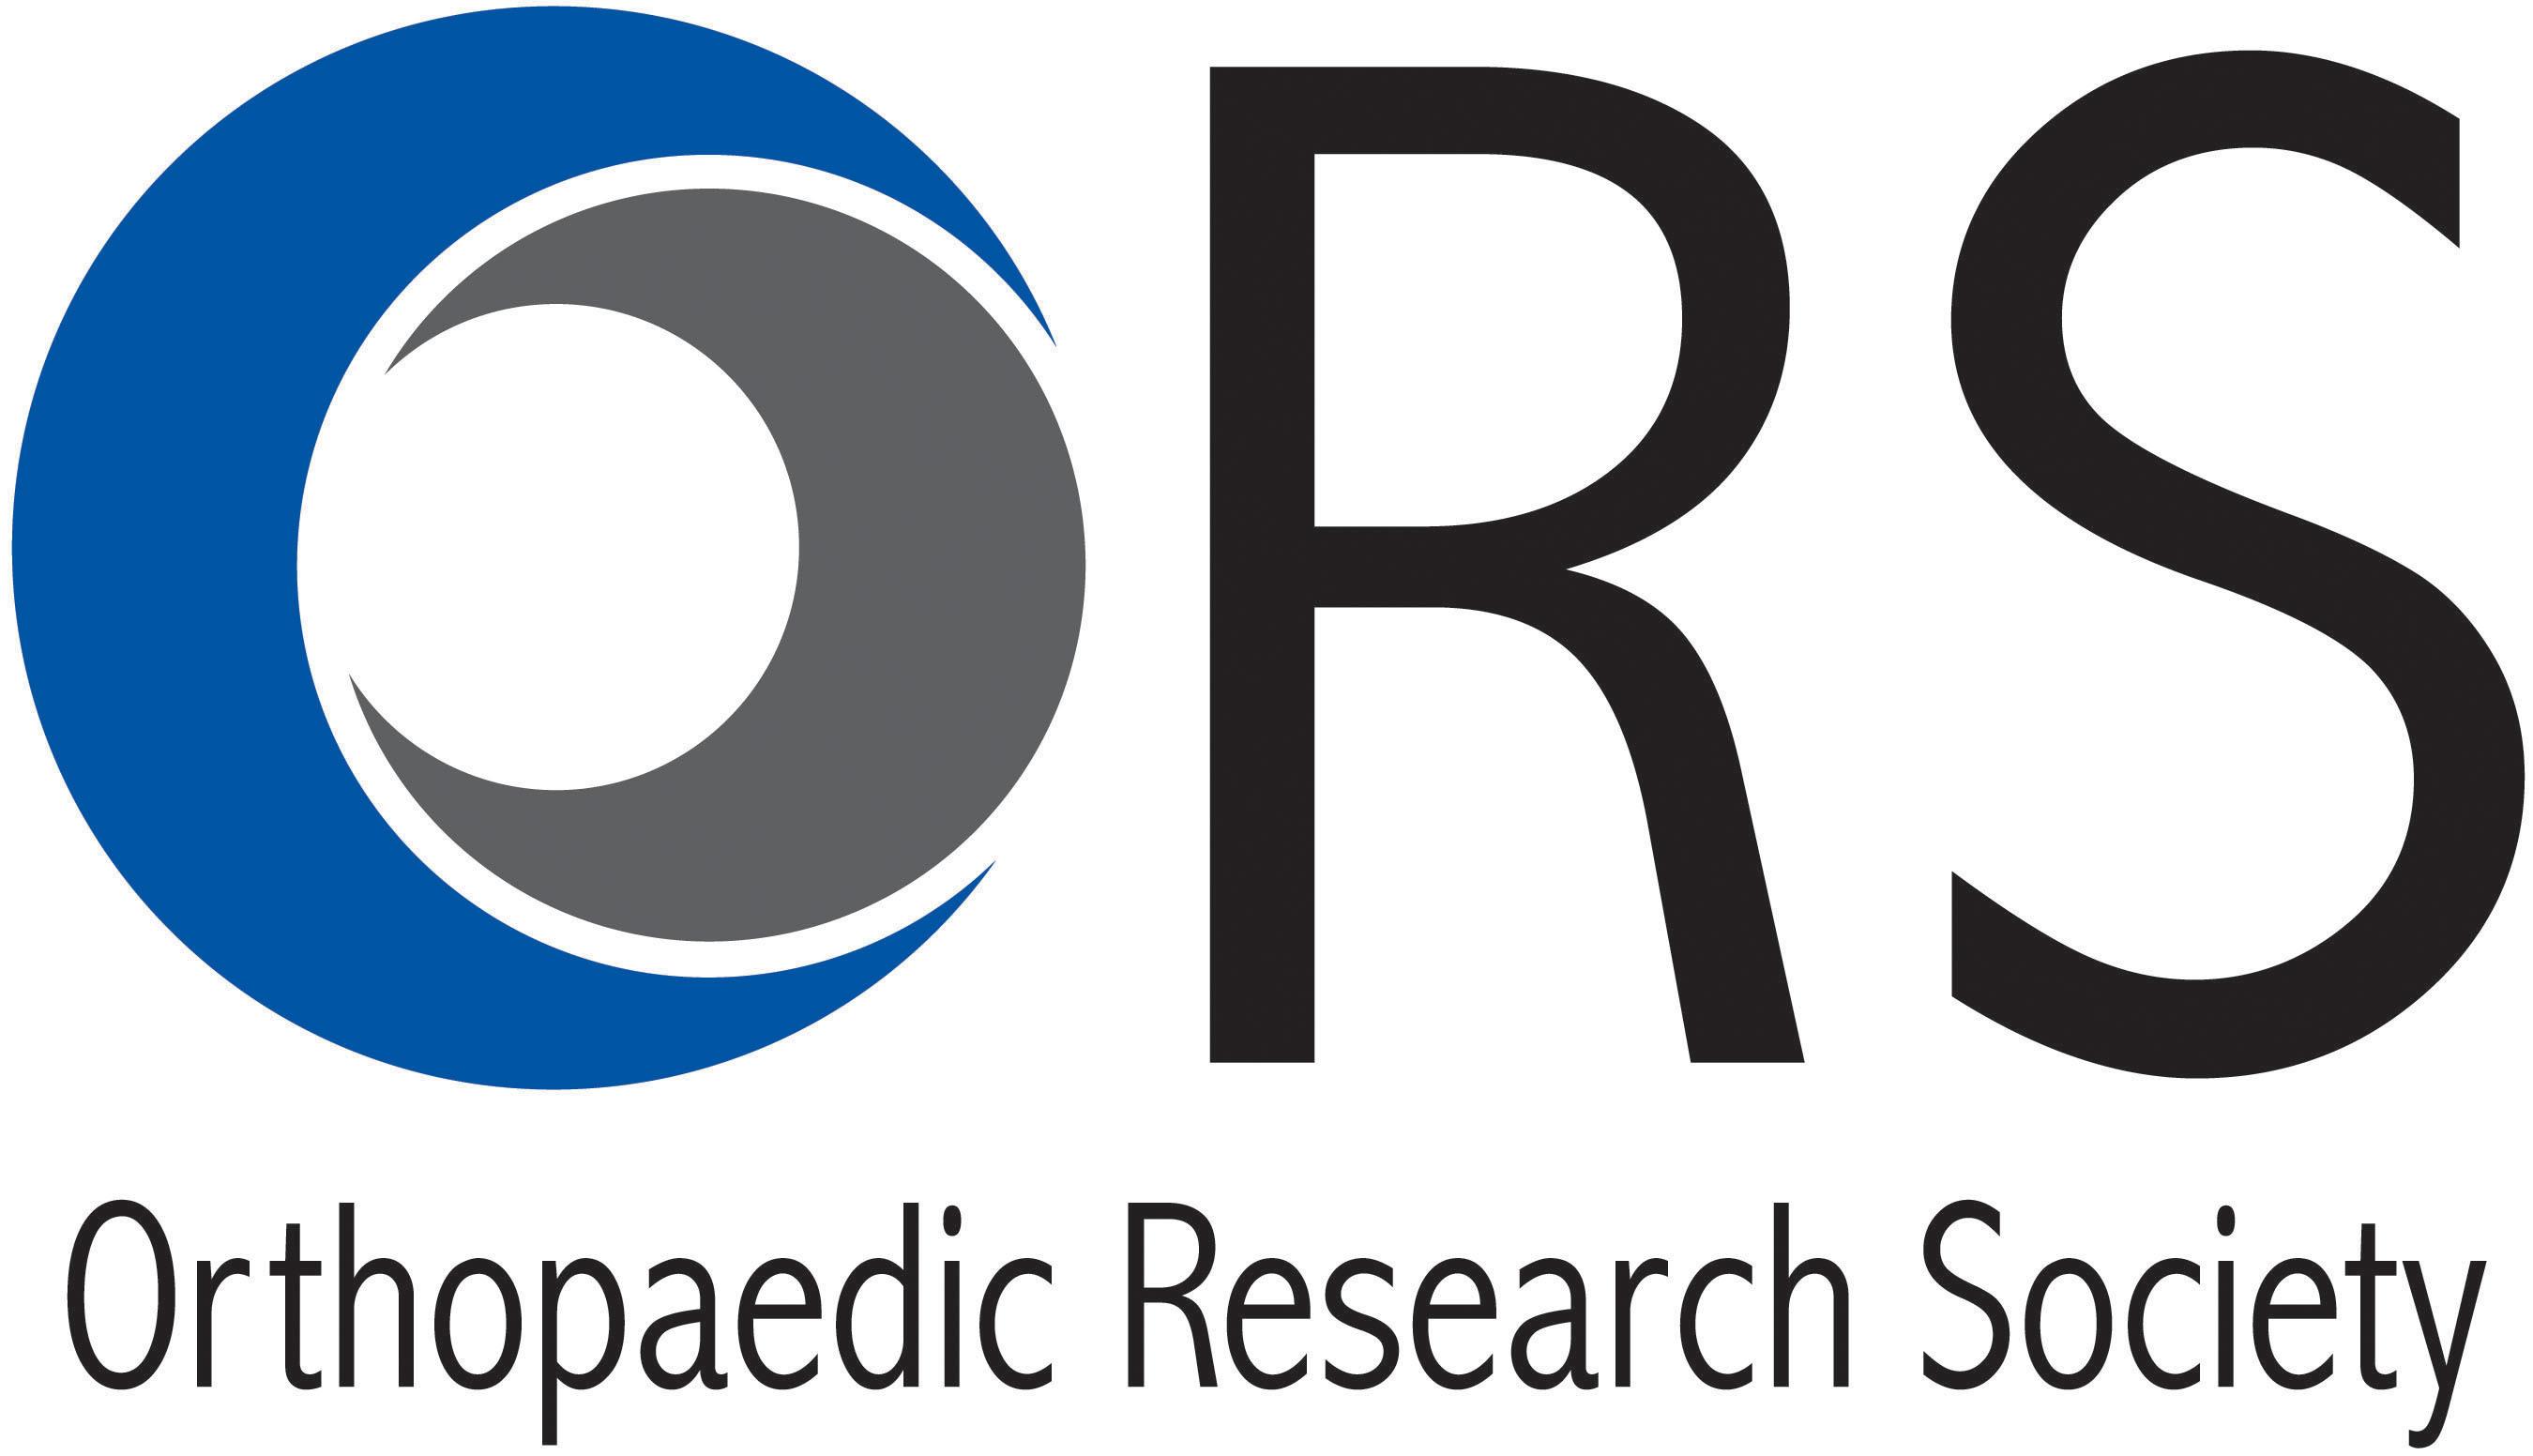 Orthopaedic Research Society logo. (PRNewsFoto/Orthopaedic Research Society) (PRNewsFoto/Orthopaedic Research Society)